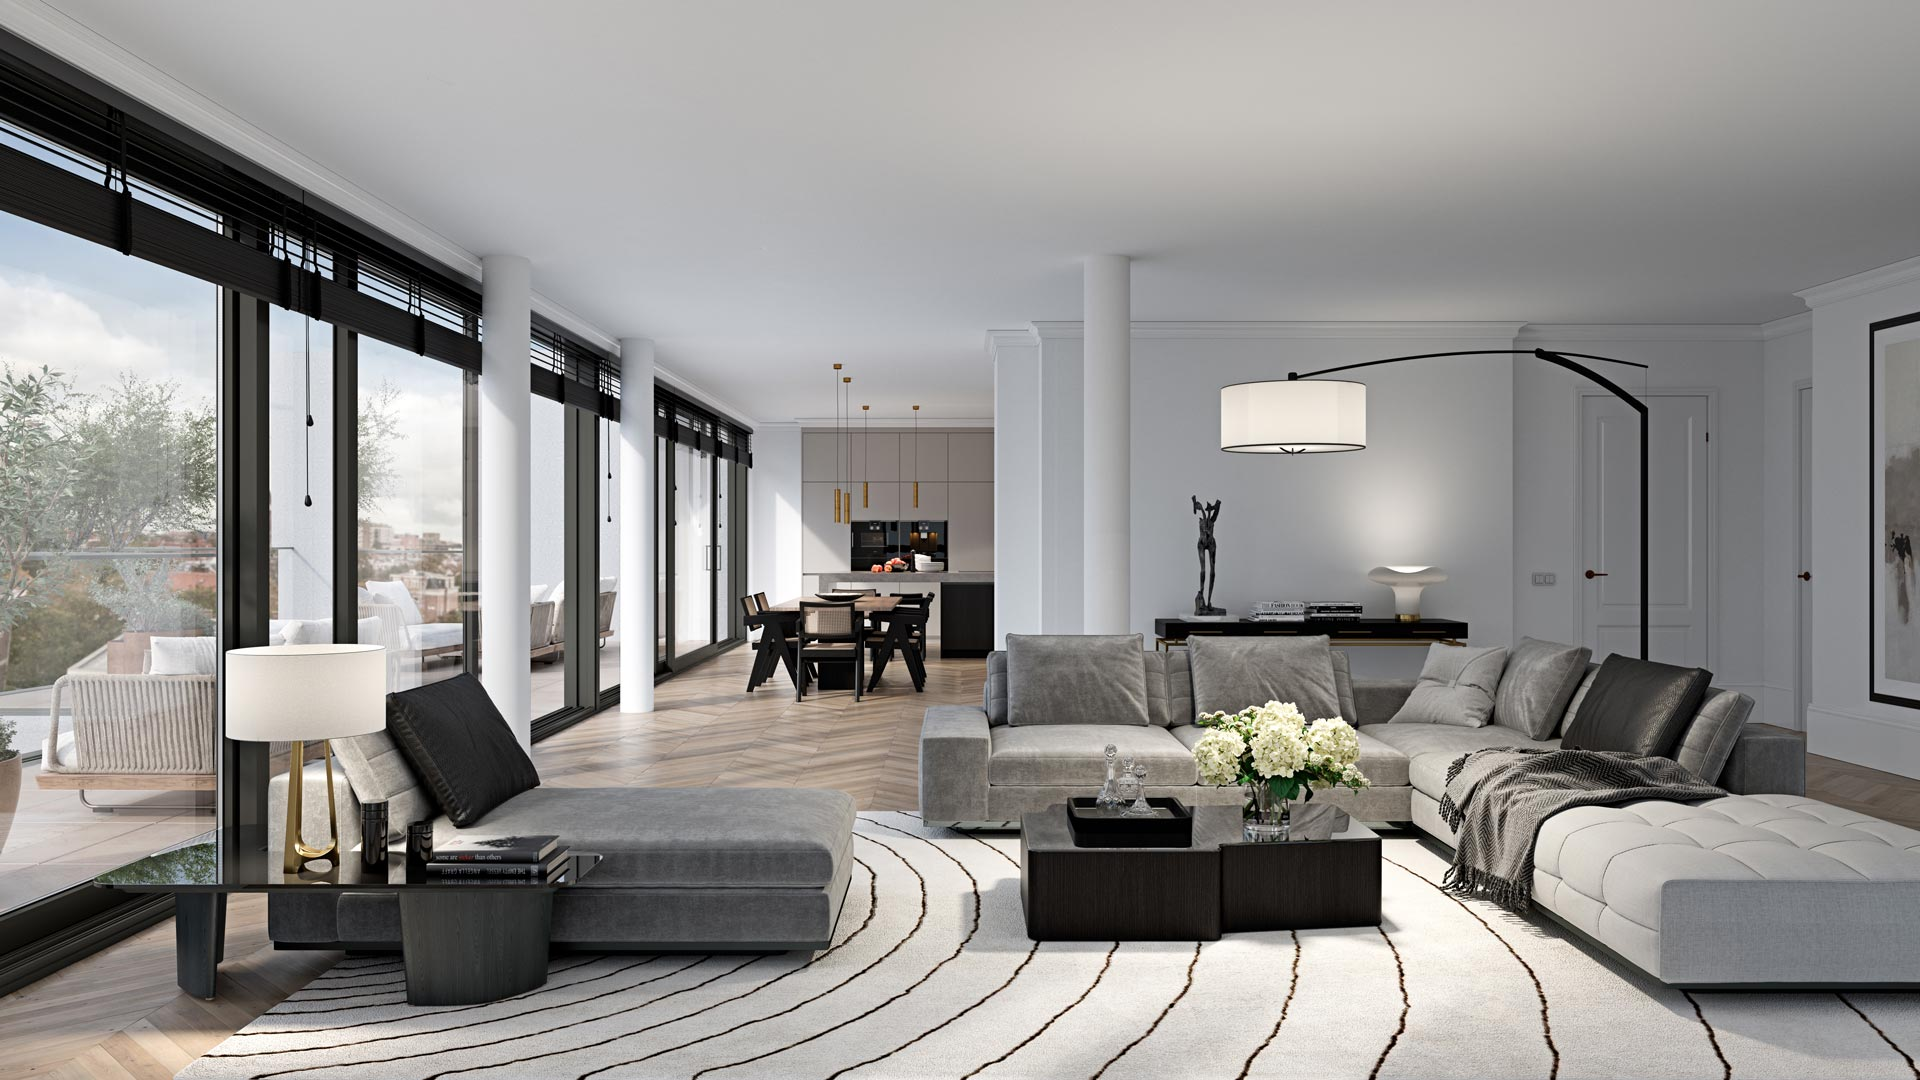 Type F - Interieur Slaapkamer - Appartementen - Elion Park